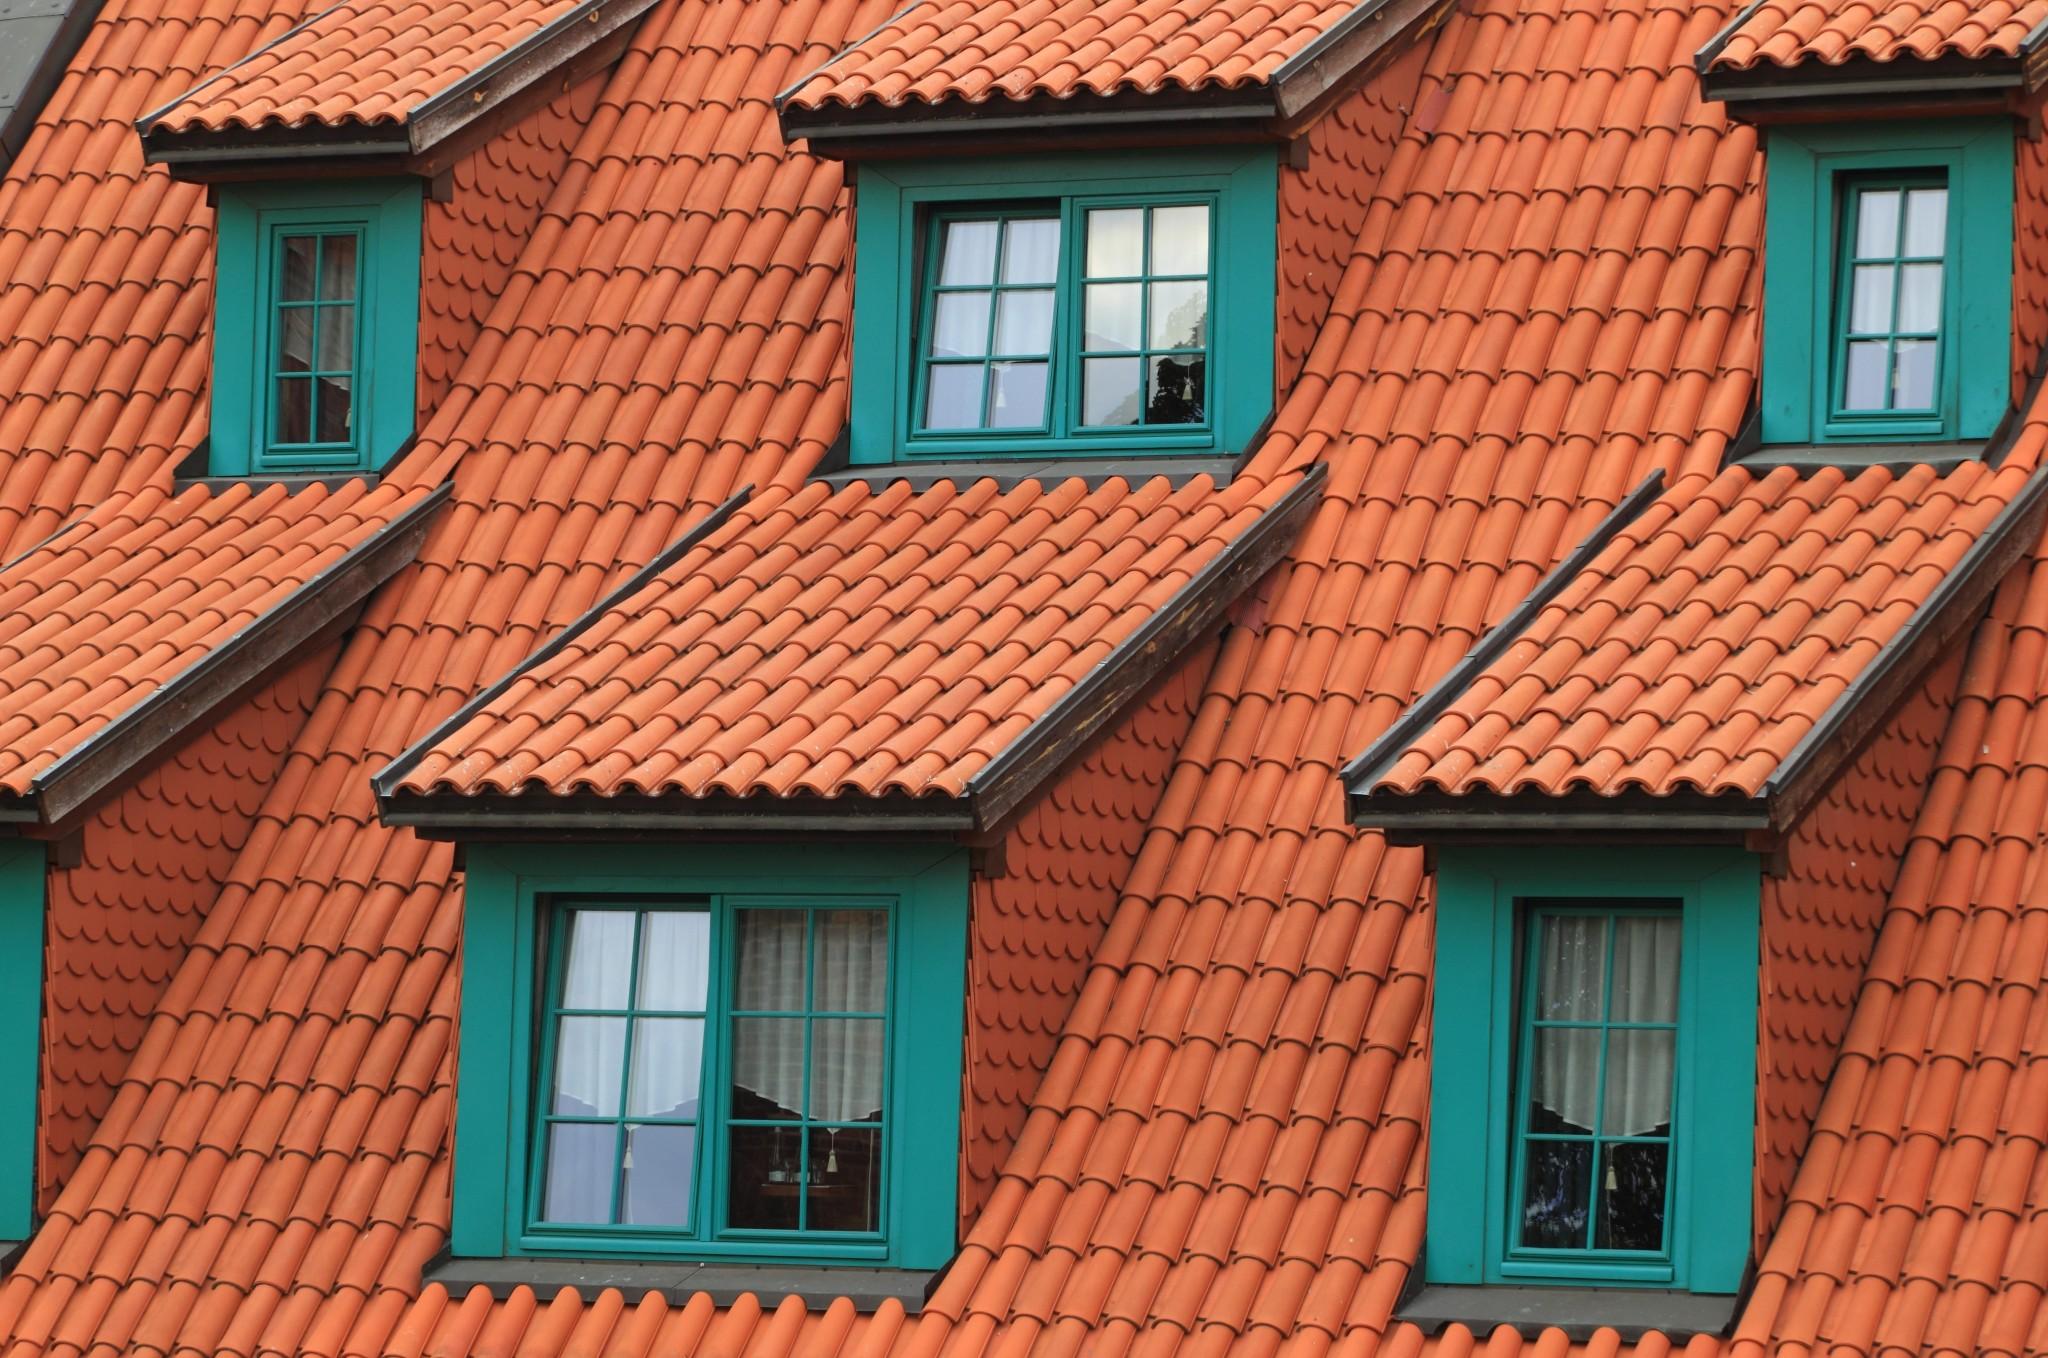 southeastern-premier-roofing-358667-unsplash